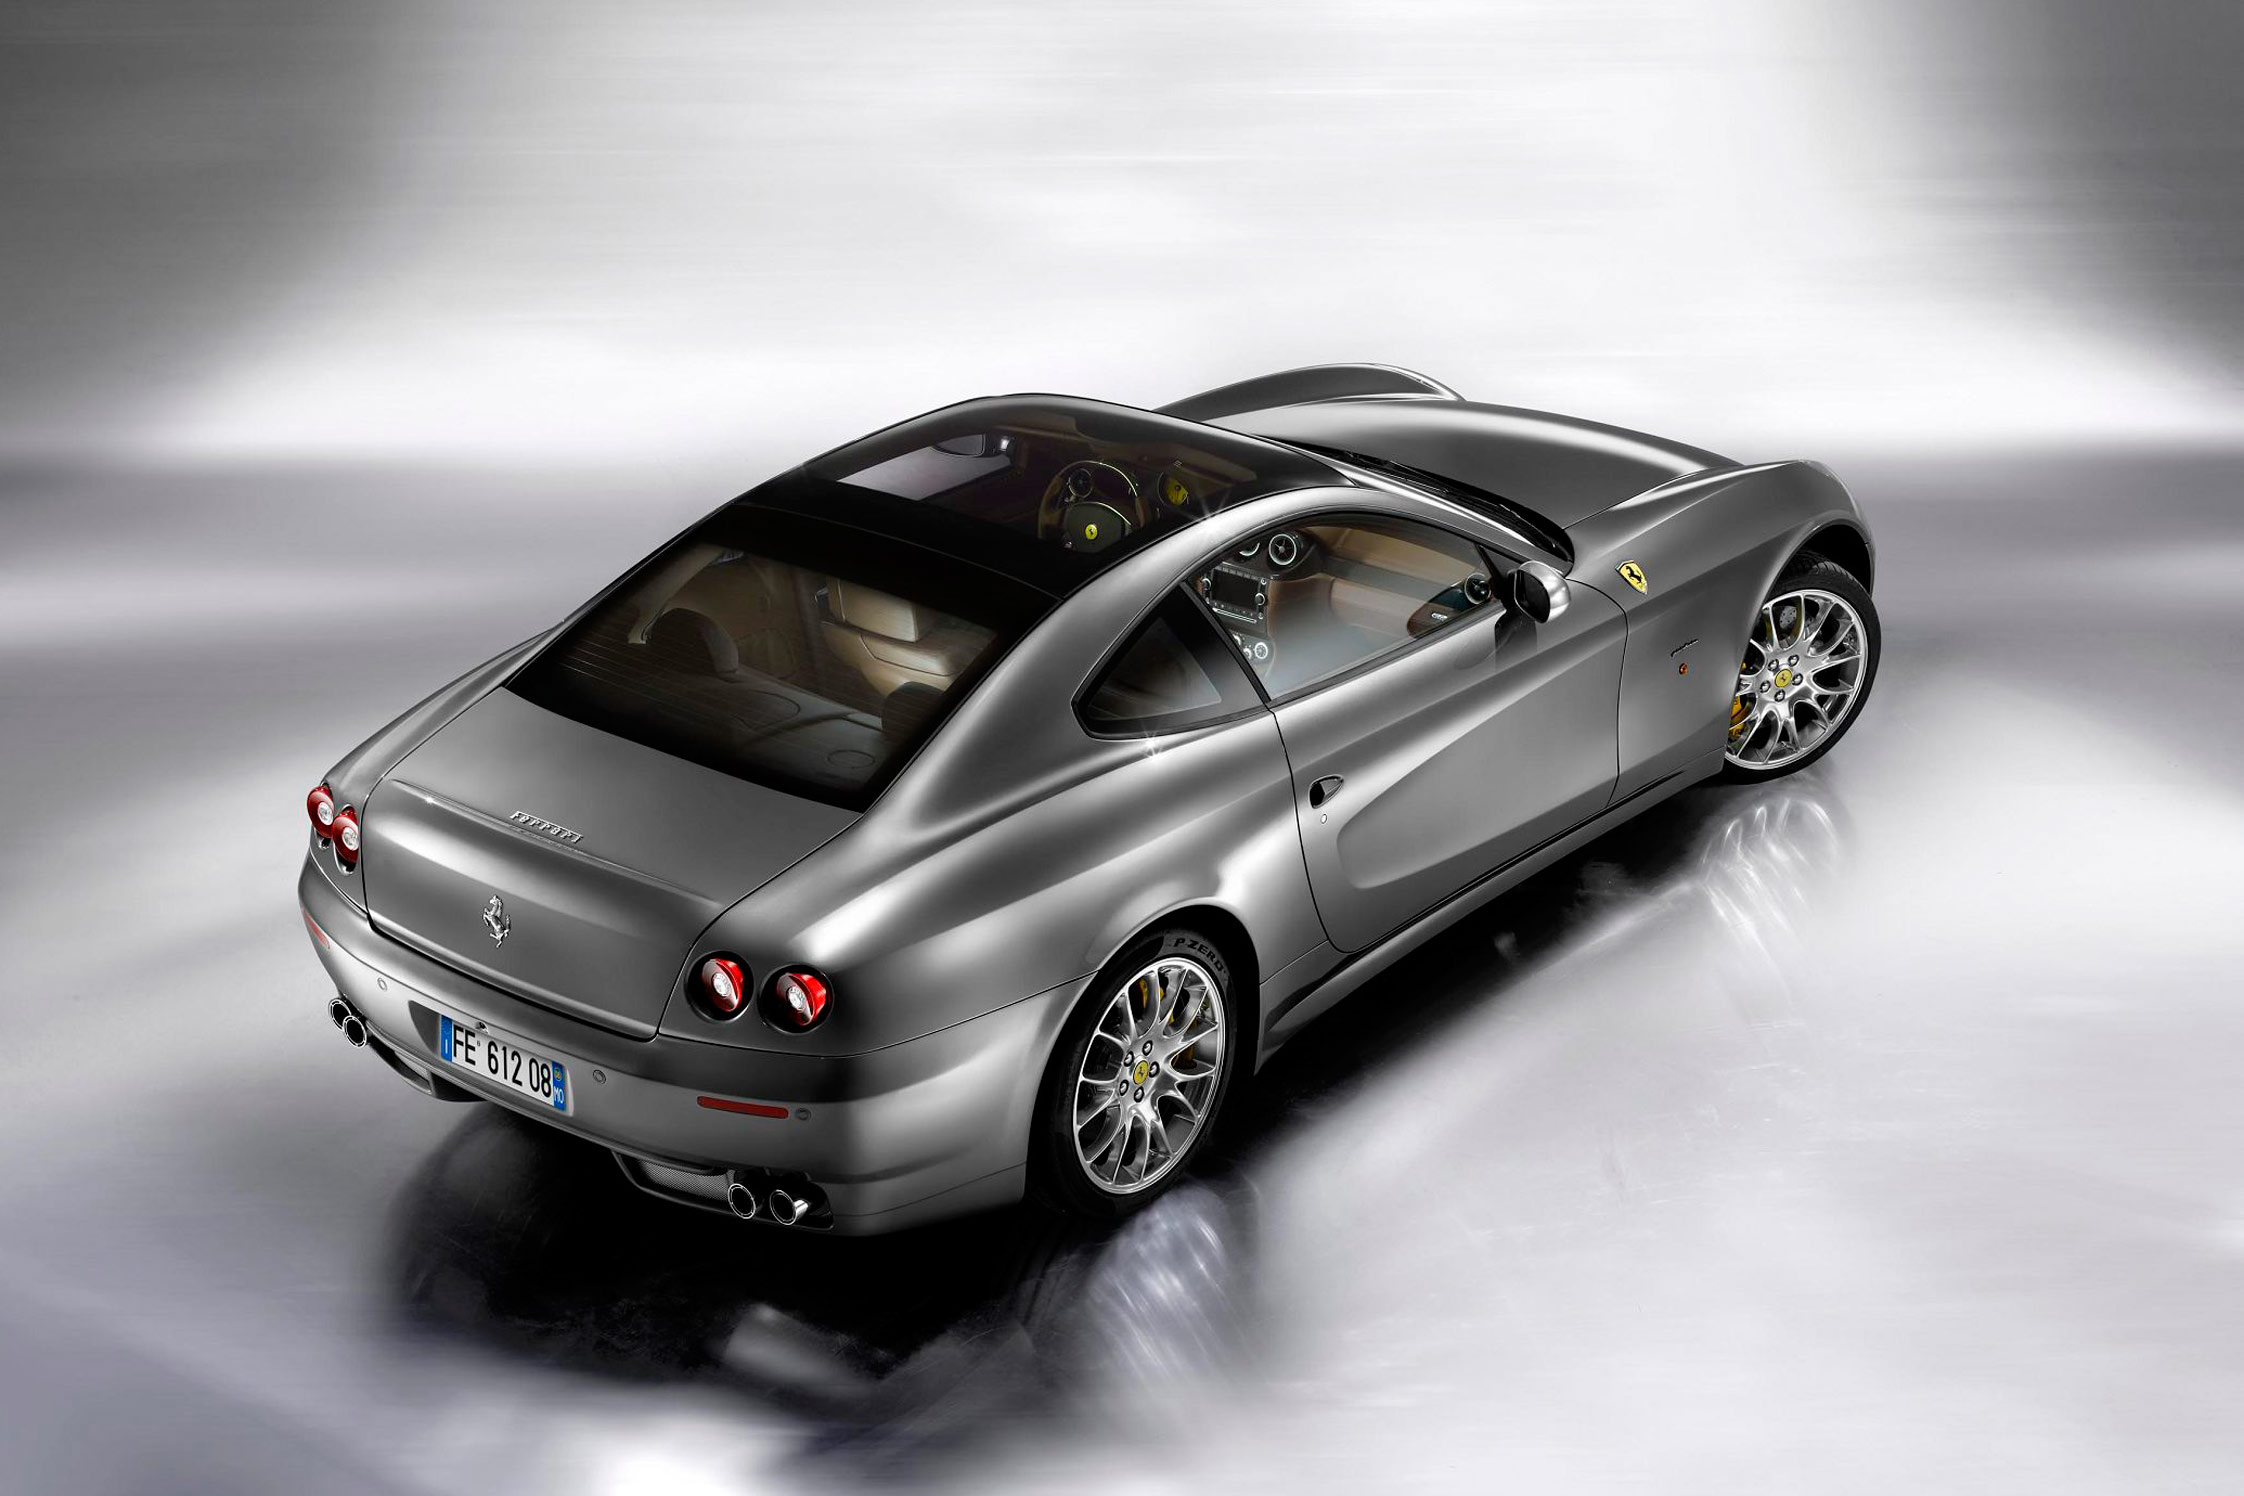 http://photo-voiture.motorlegend.com/hd/ferrari-612-scaglietti-56509.jpg